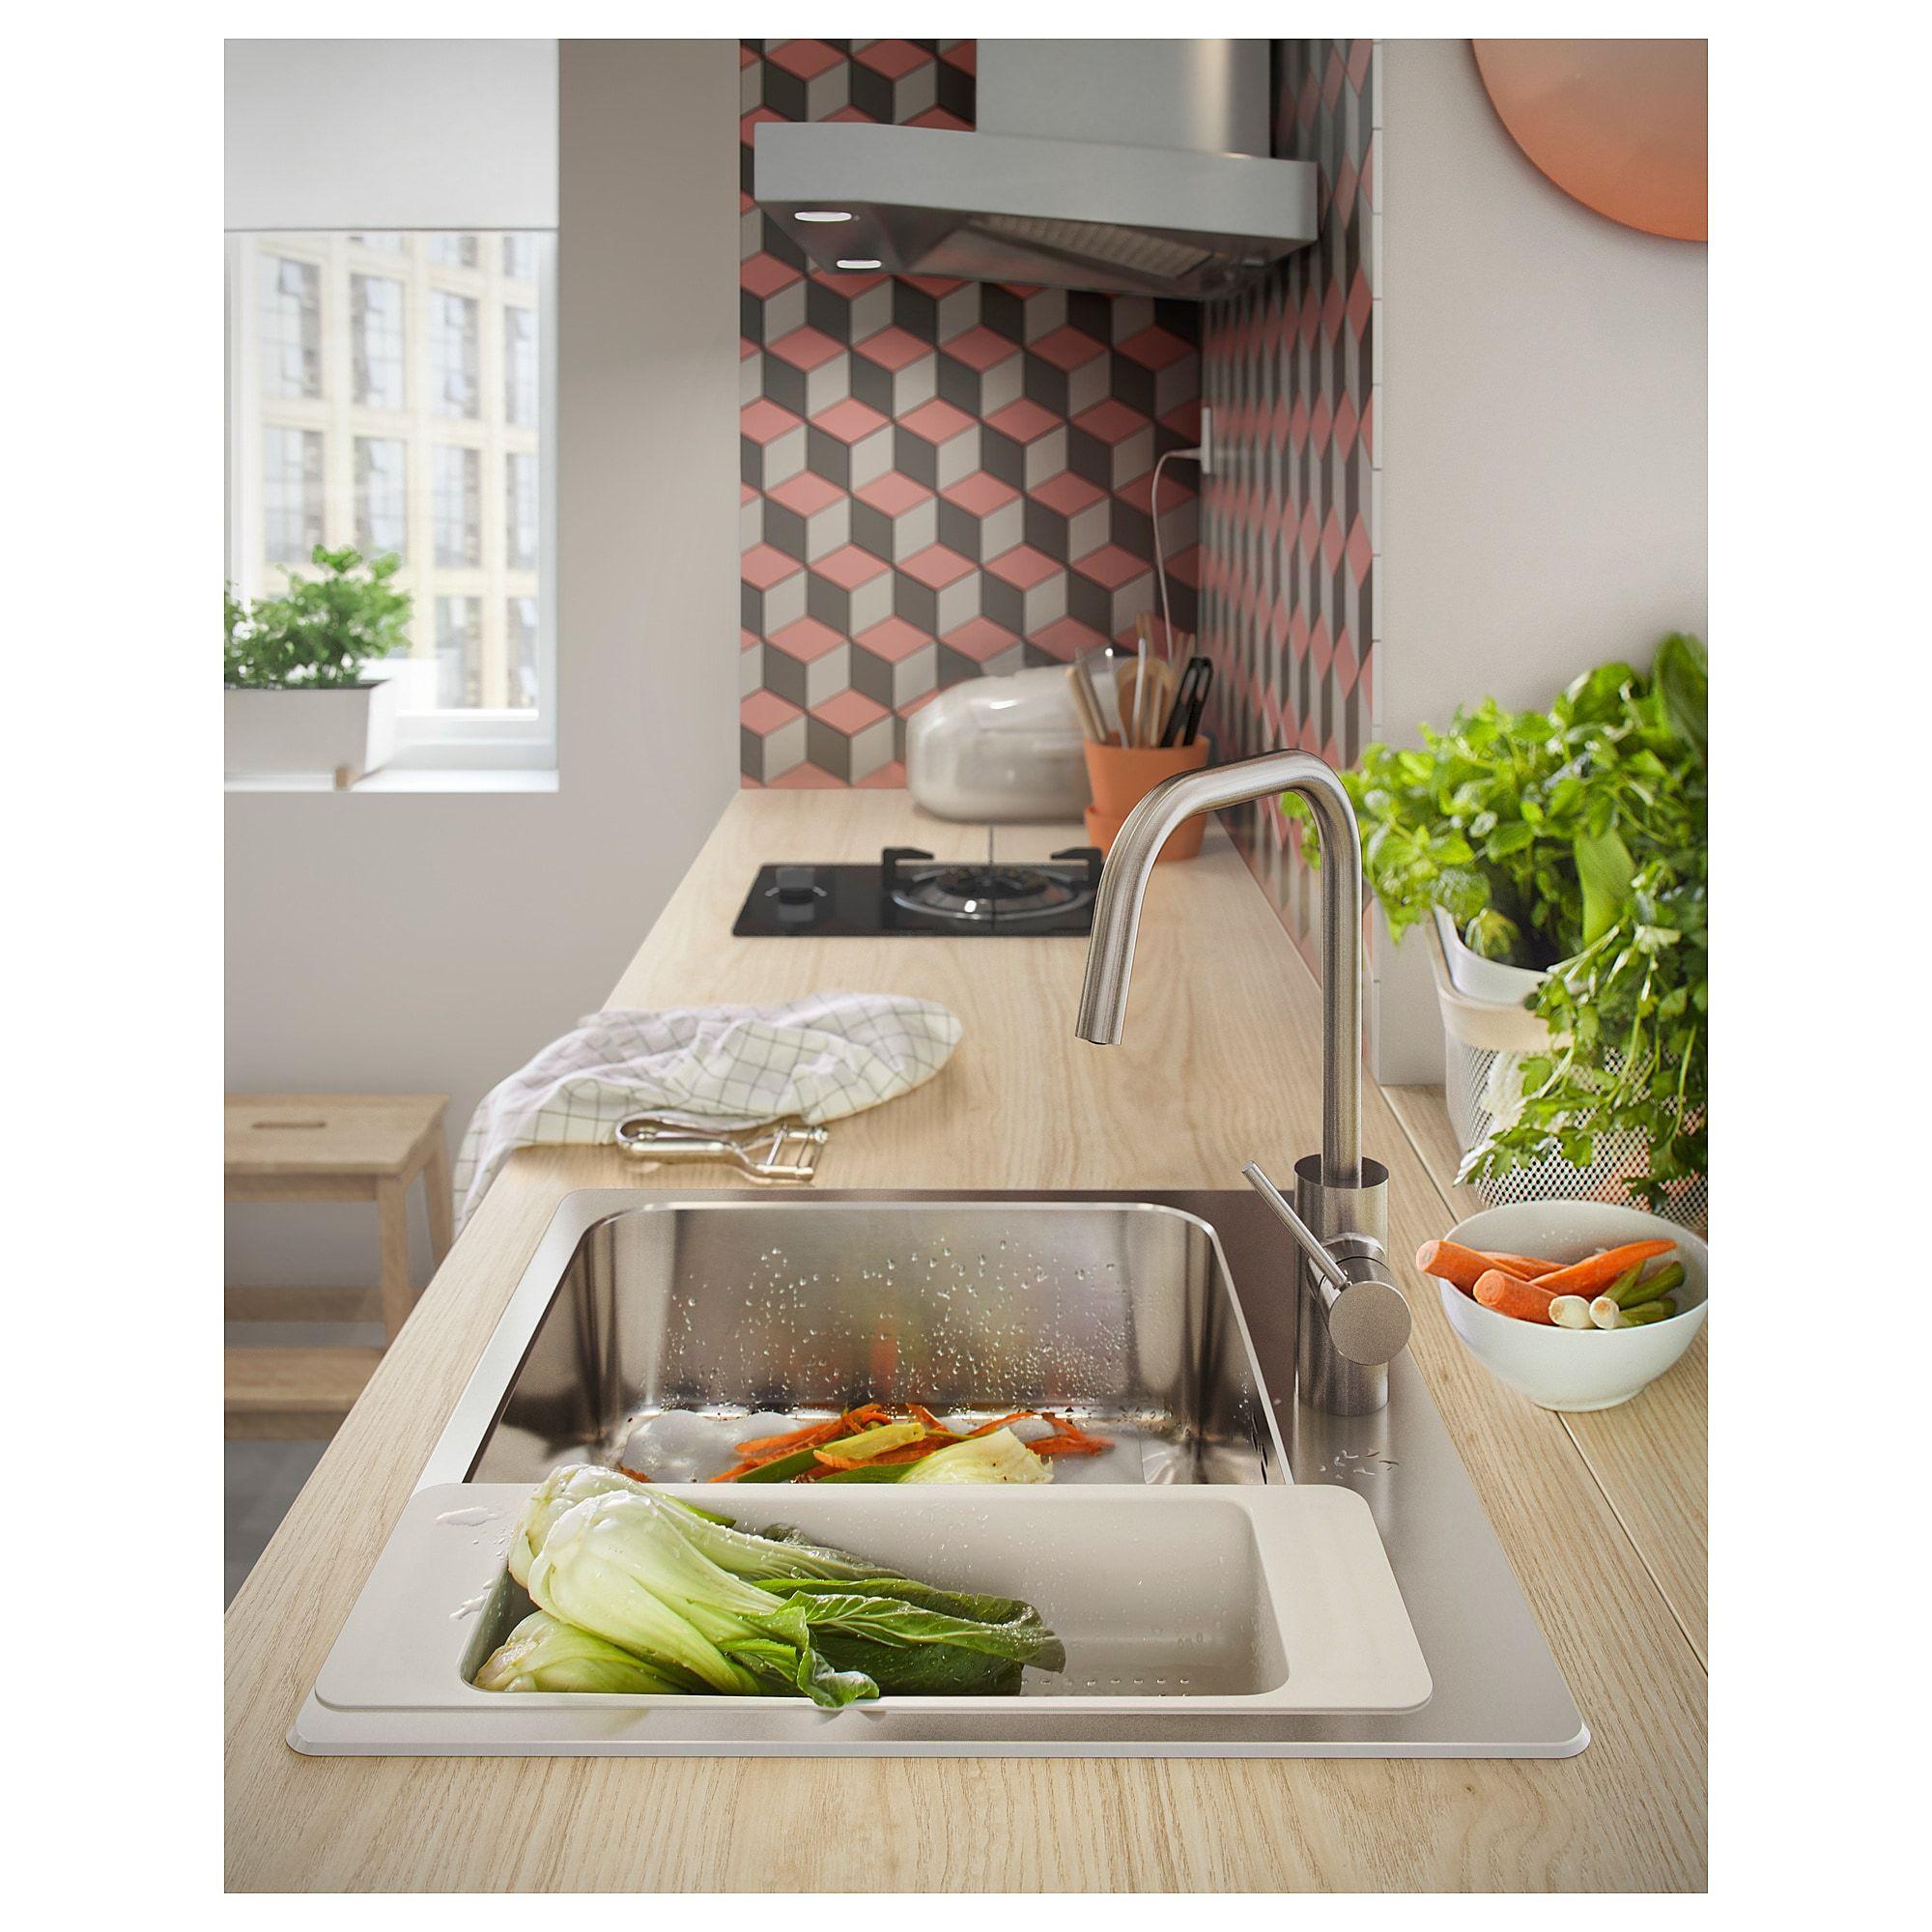 Ekbacken Countertop Ash Effect Laminate 74x1 1 8 188x2 8 Cm Countertops Laminate Countertops Kitchen Remodel